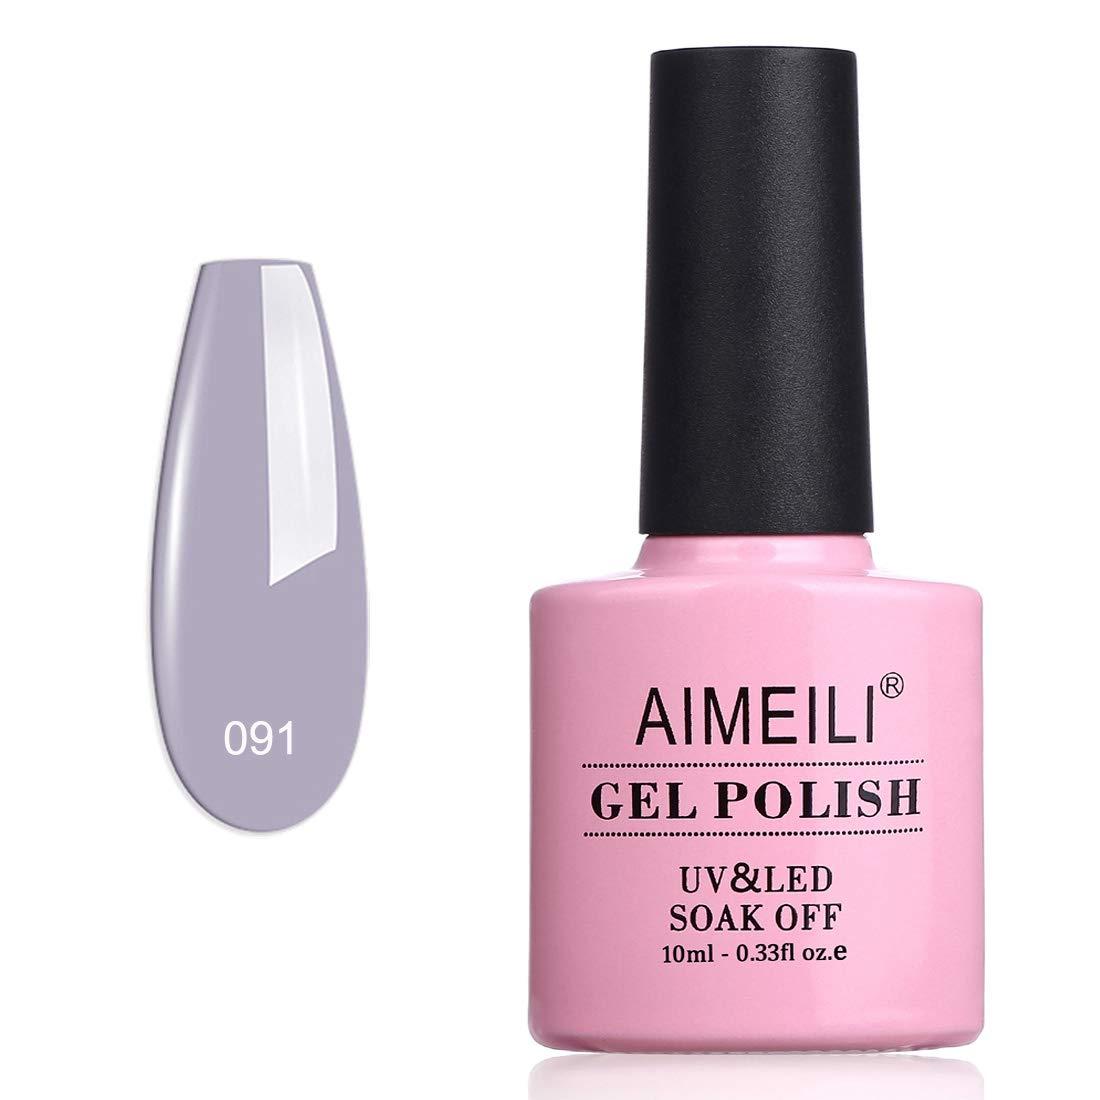 AIMEILI Soak Off UV LED Gel Nail Polish - Midnight Leisurely Look (091) 10ml